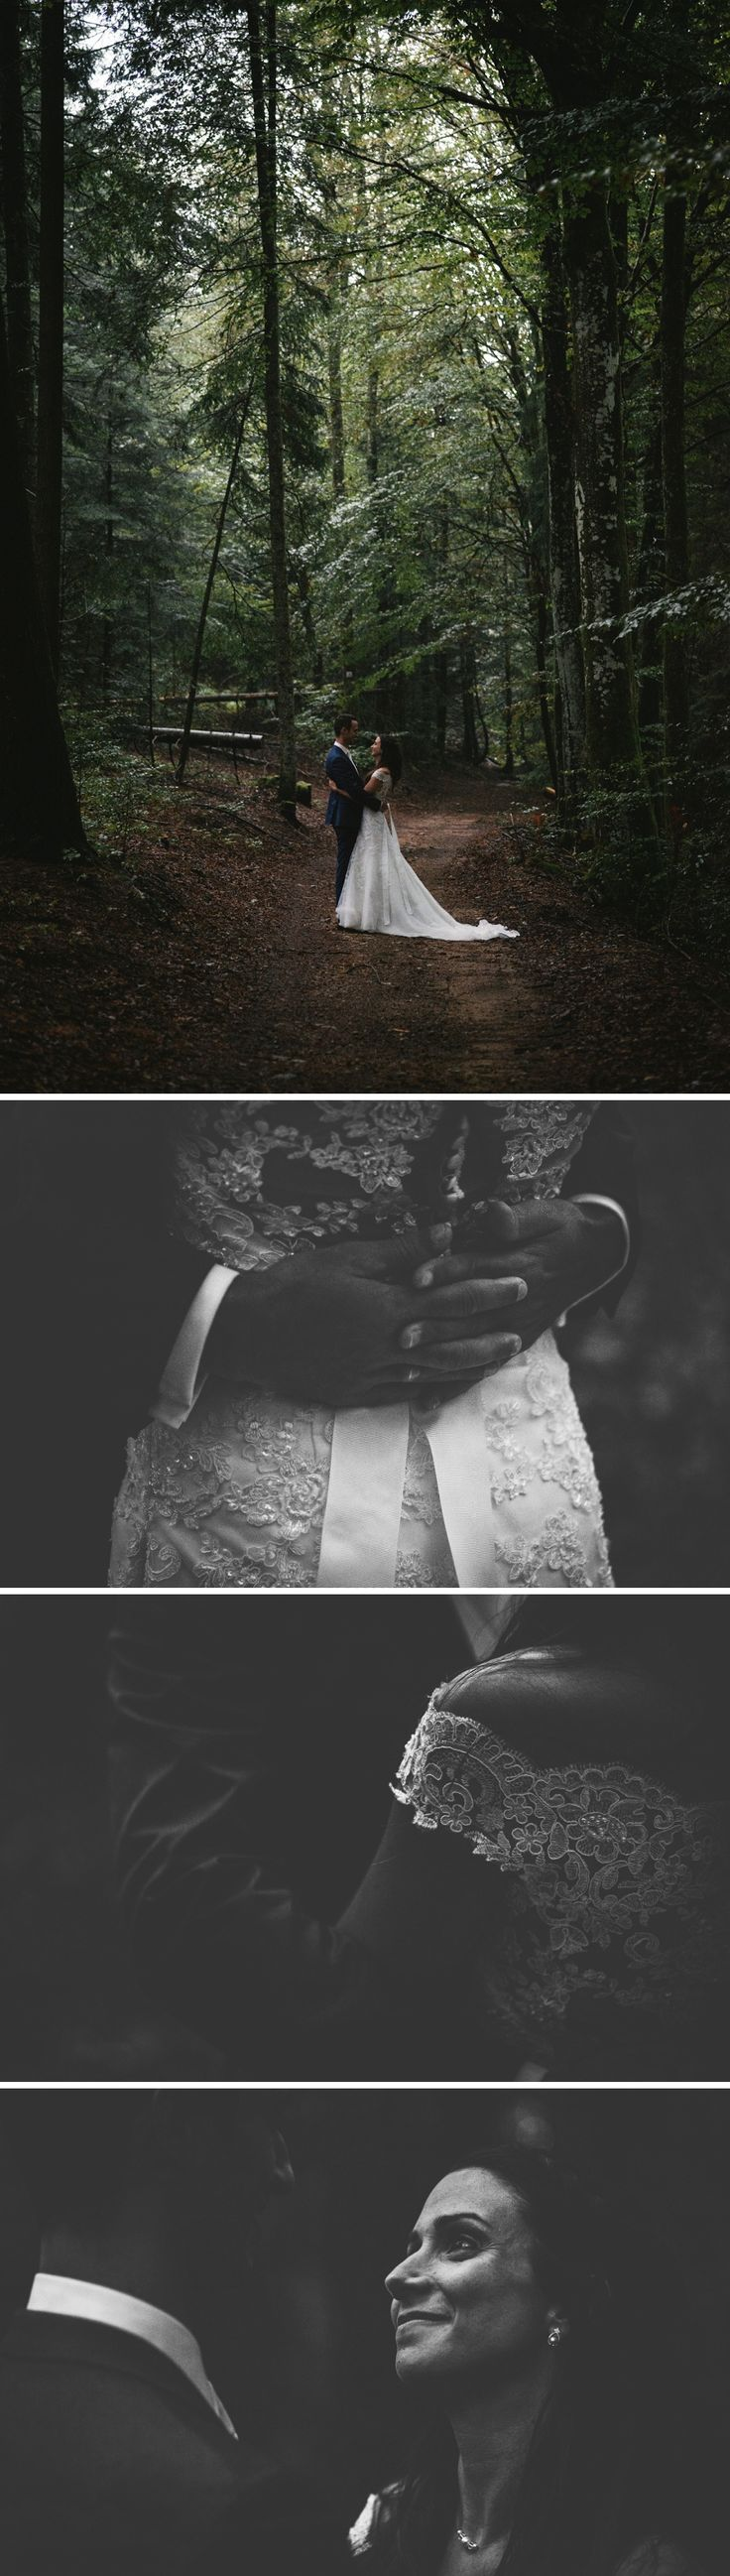 Couple pictures in the forest - Puy de Dôme photographer - Zephyr & Luna photography